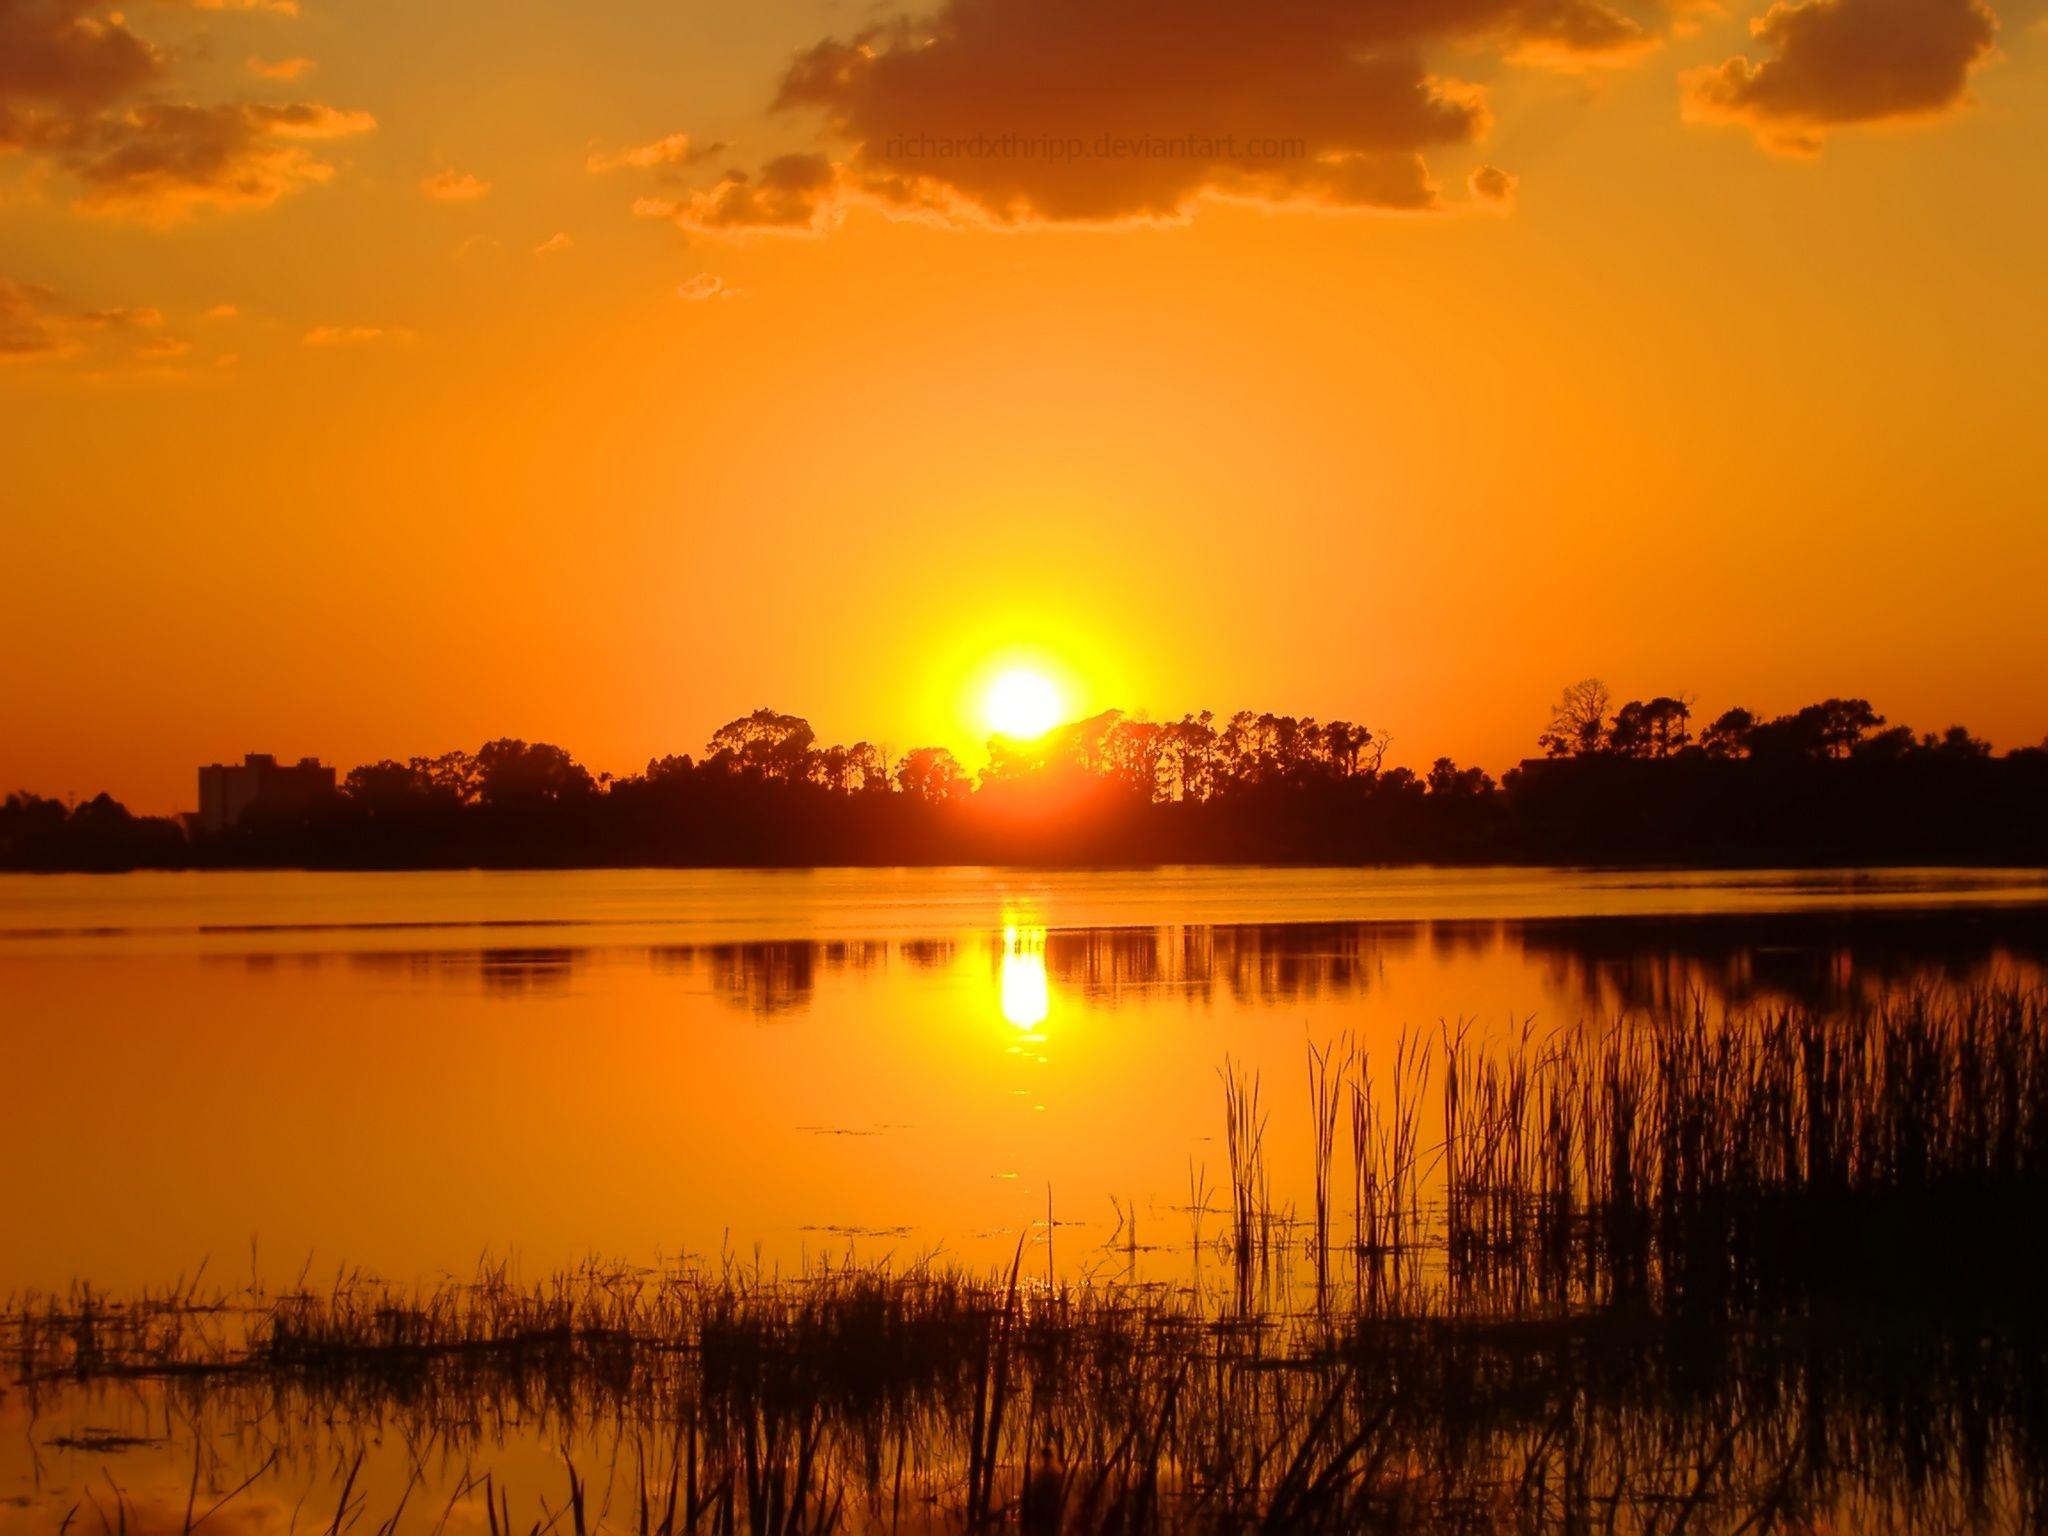 Resultado de imágenes de Google para http://besthdwalls.com/wp-content/uploads/2012/09/Fiery-Orange-Sunset.jpg